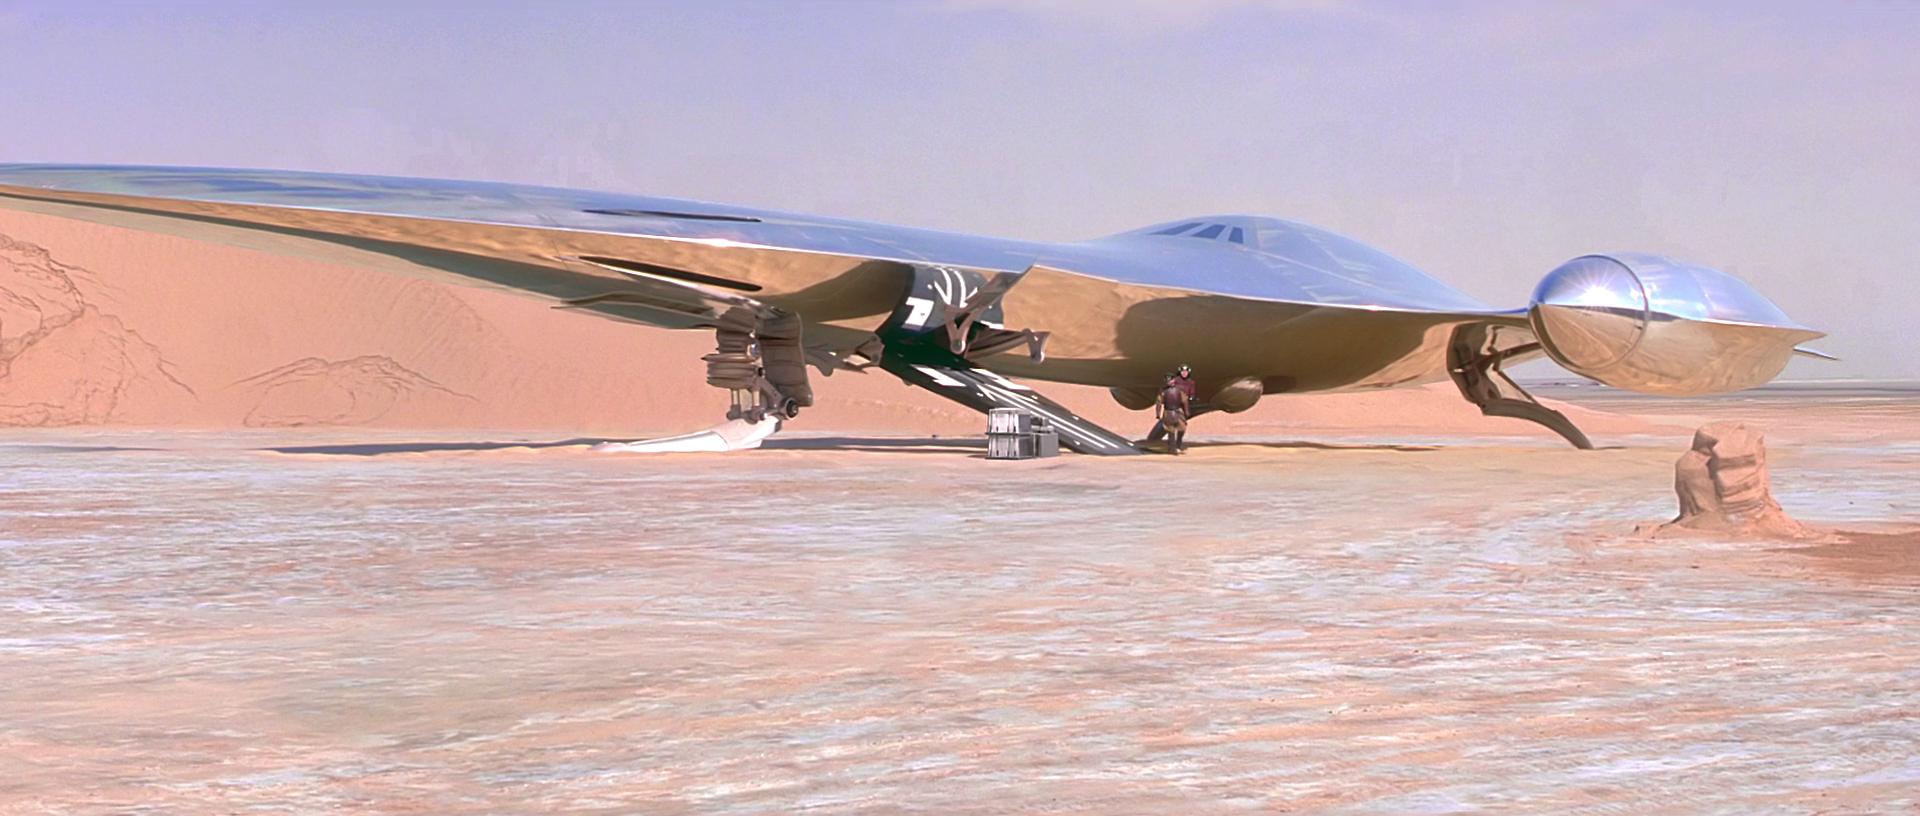 Star Wars CCG Coruscant Queen/'s Royal Starship